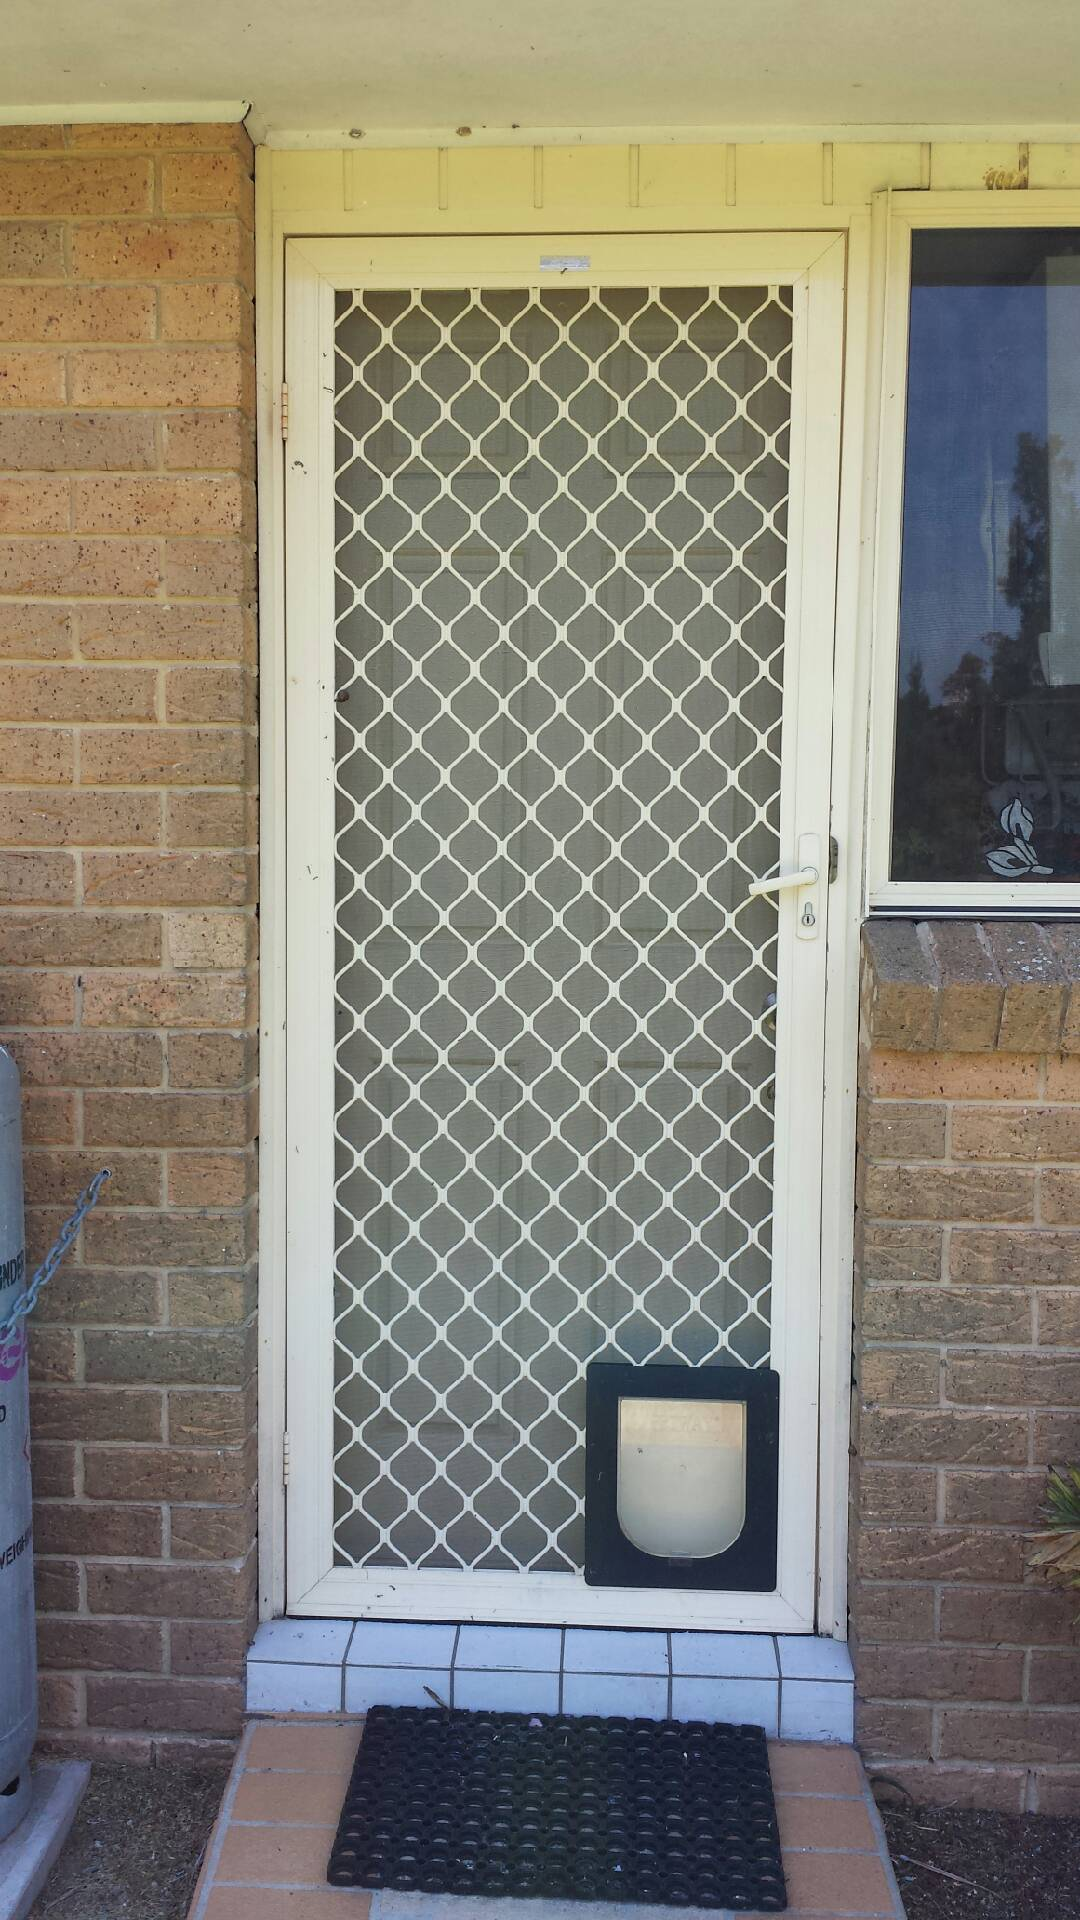 Aluminium Security Doors Screens Hunter Valley Security Doors